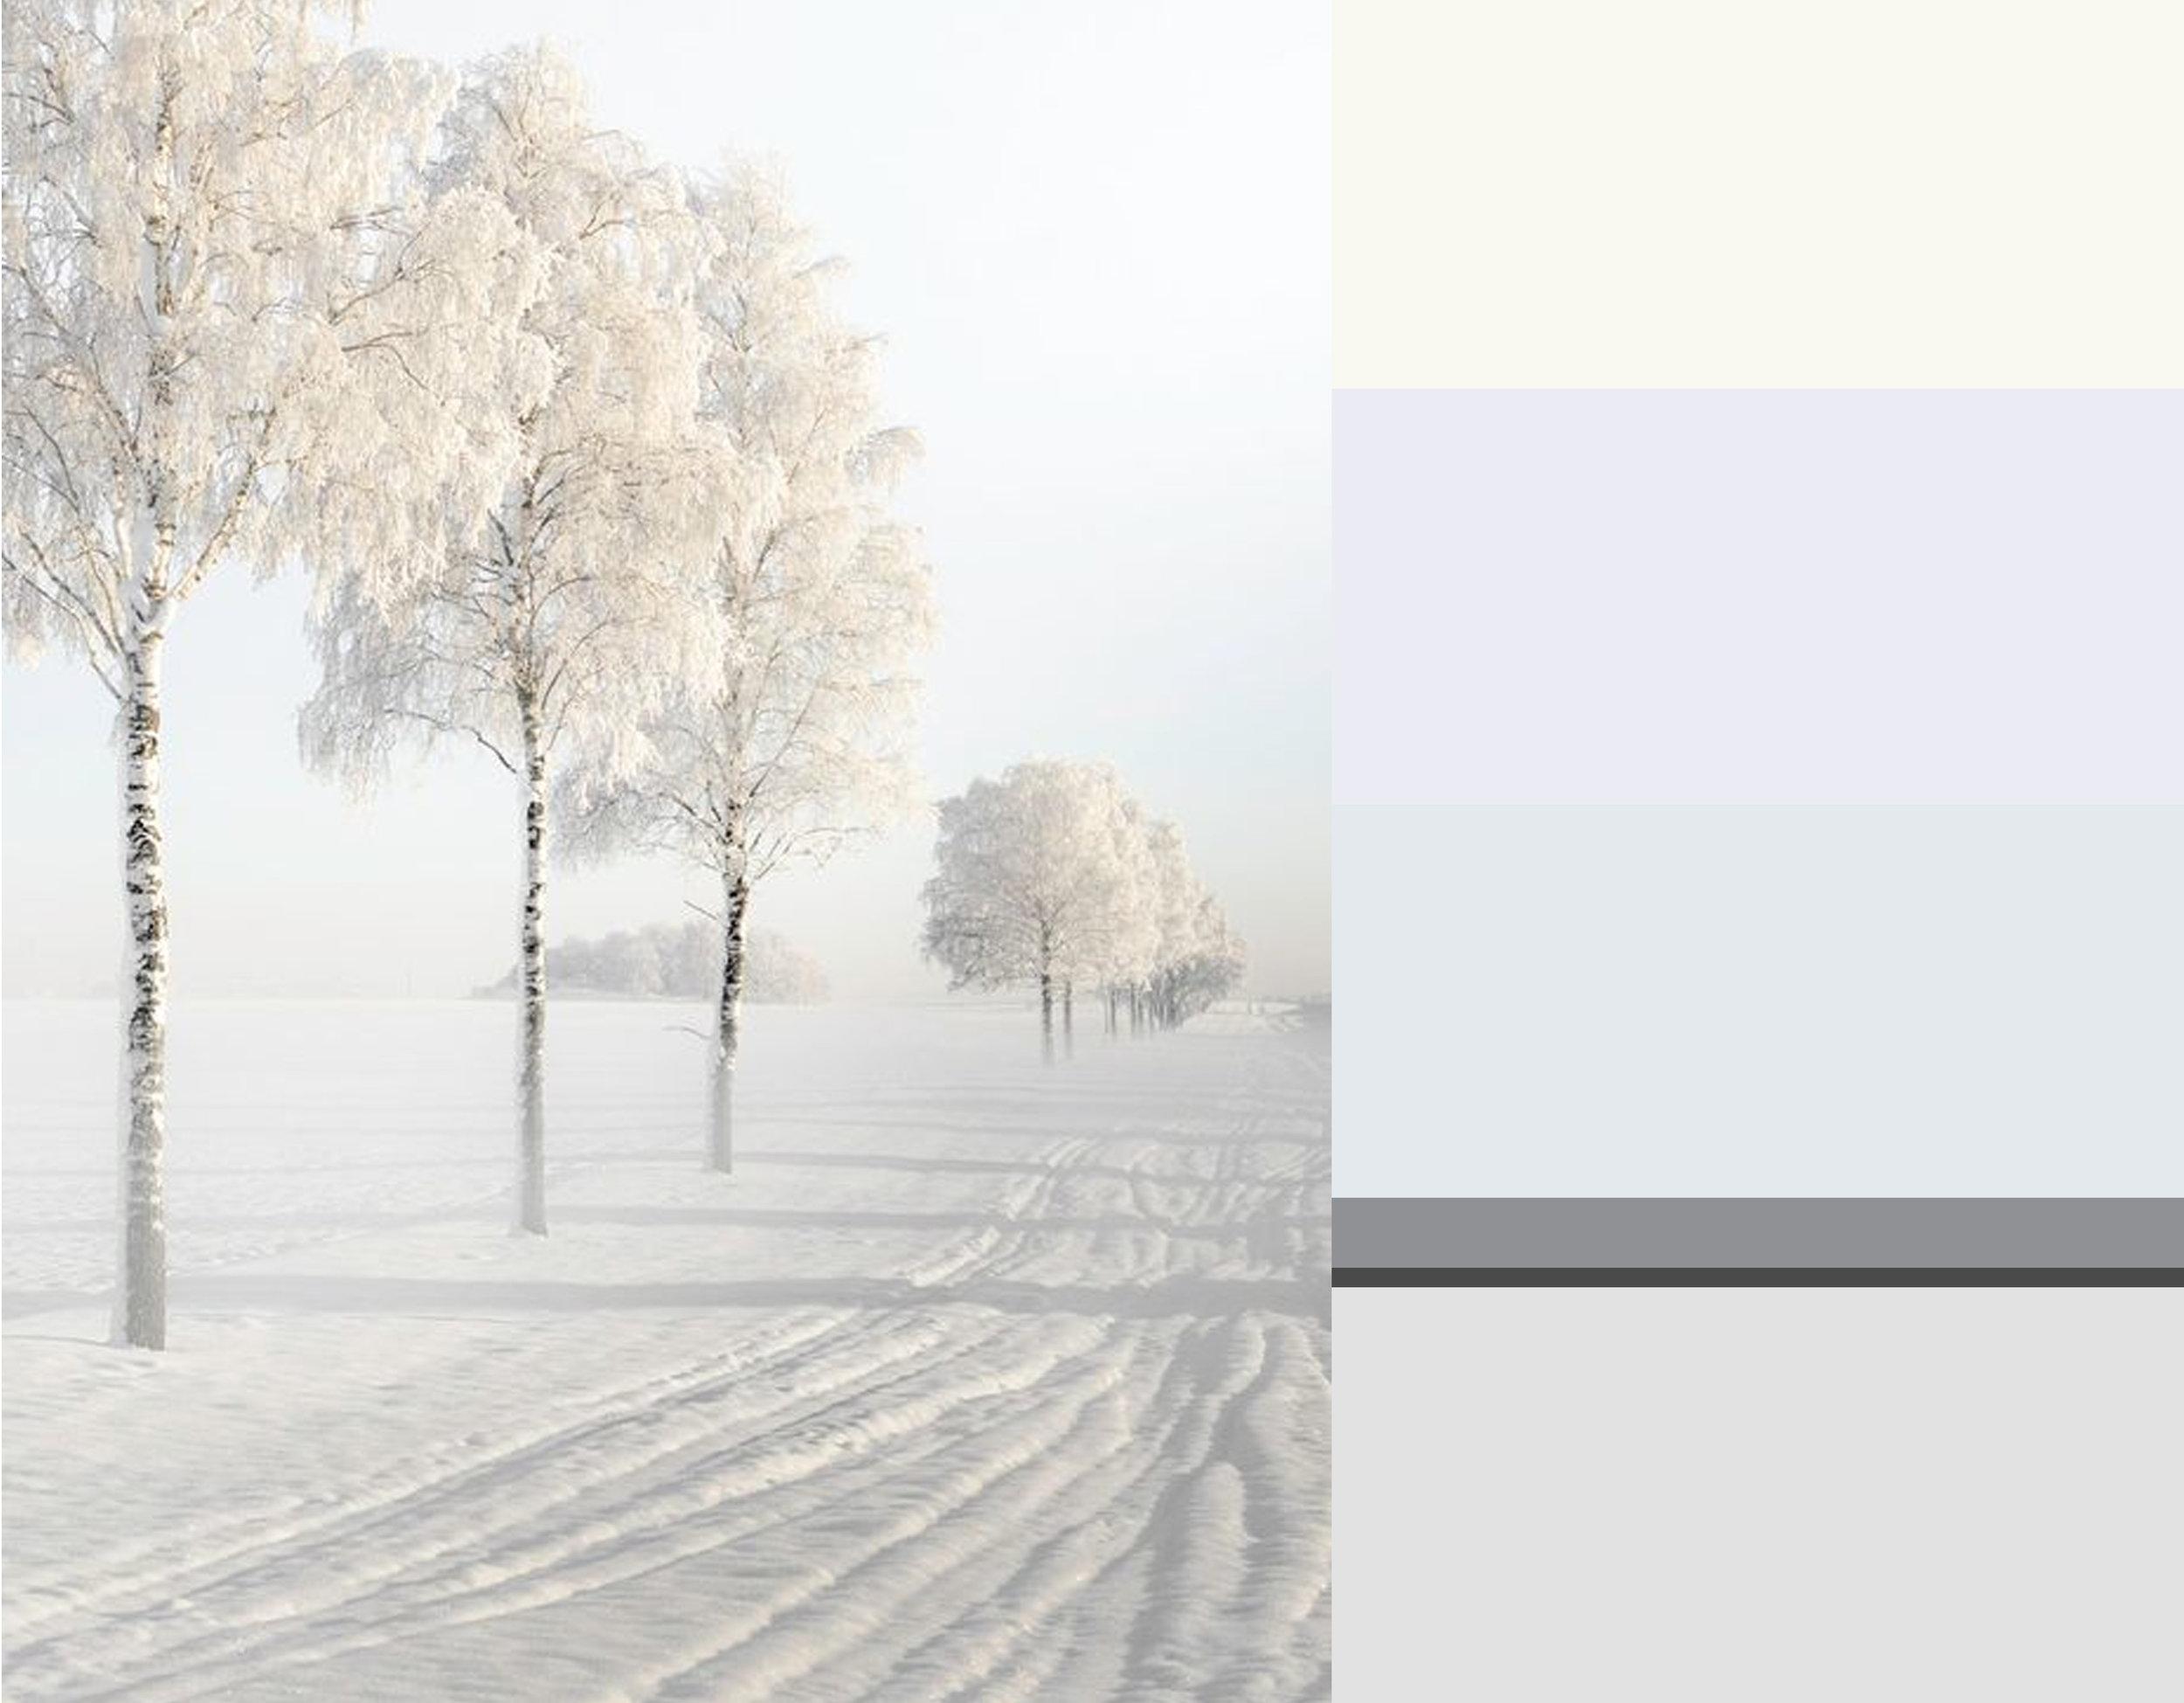 winter image via  Expressions of nature  - colors from top down Milk  Zoffany  - Great White 2006  Farrow & Ball  - Quarter La Seine  Zoffany  - Mid Lead Colour 114  Little Greene  - Railings 31  Farrow & Ball  - Dimpse 277  Farrow & Ball